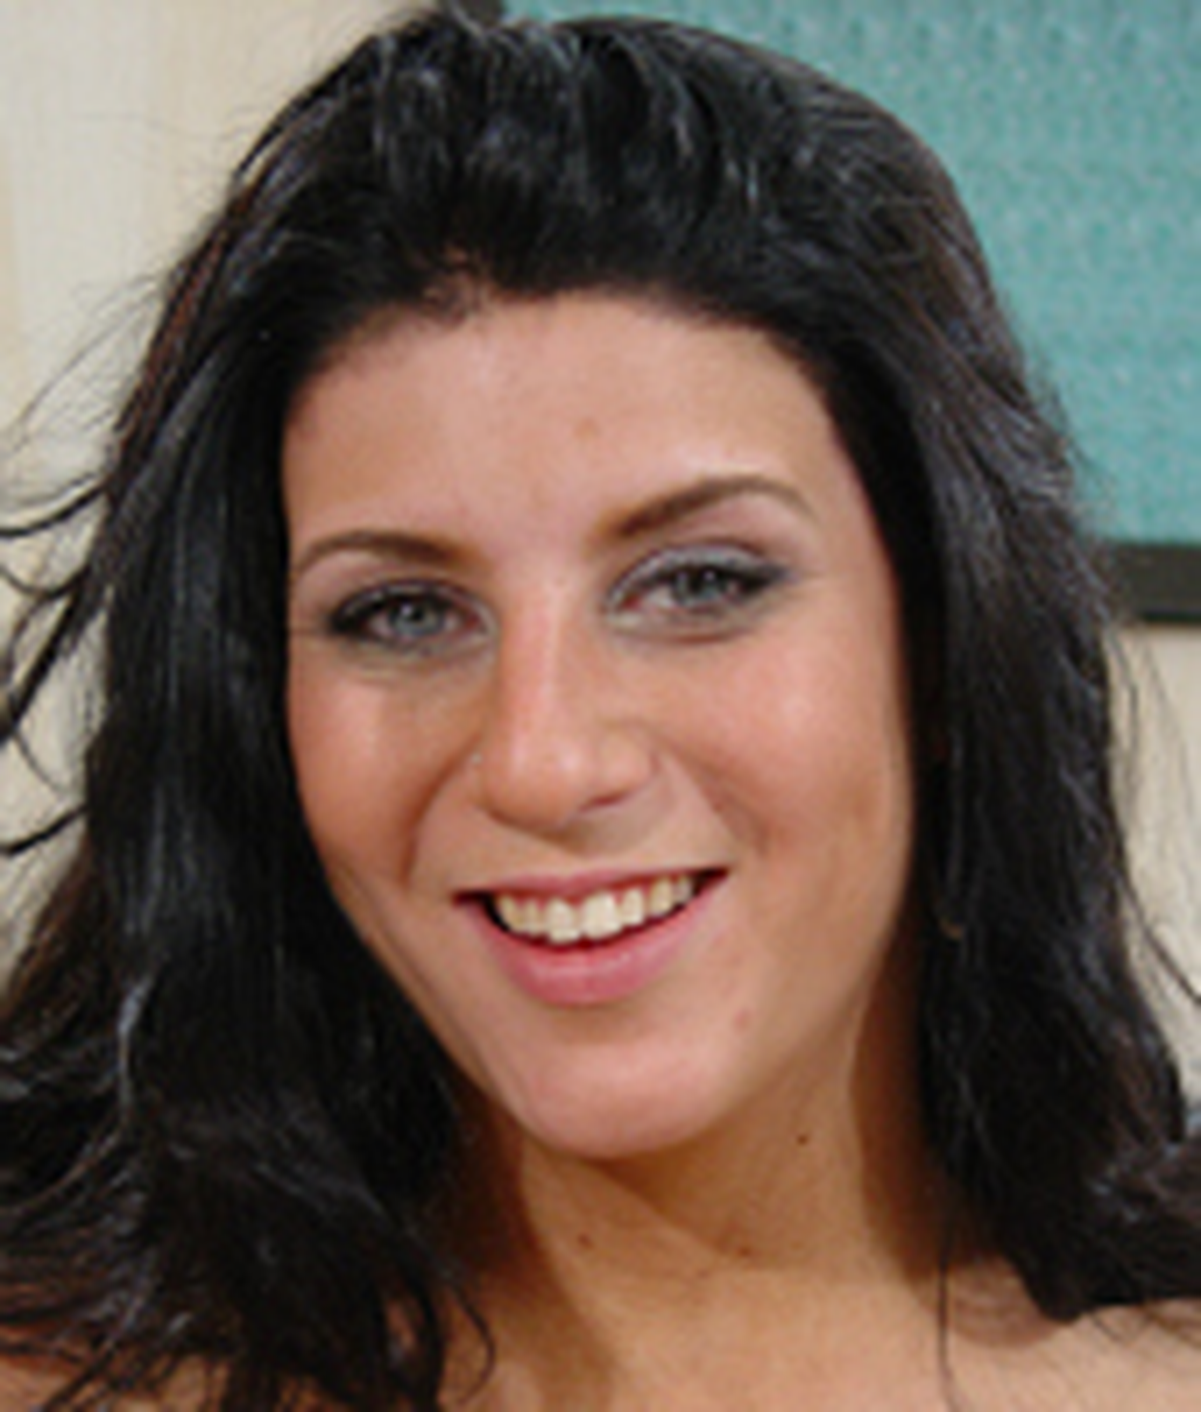 Nikki Knox